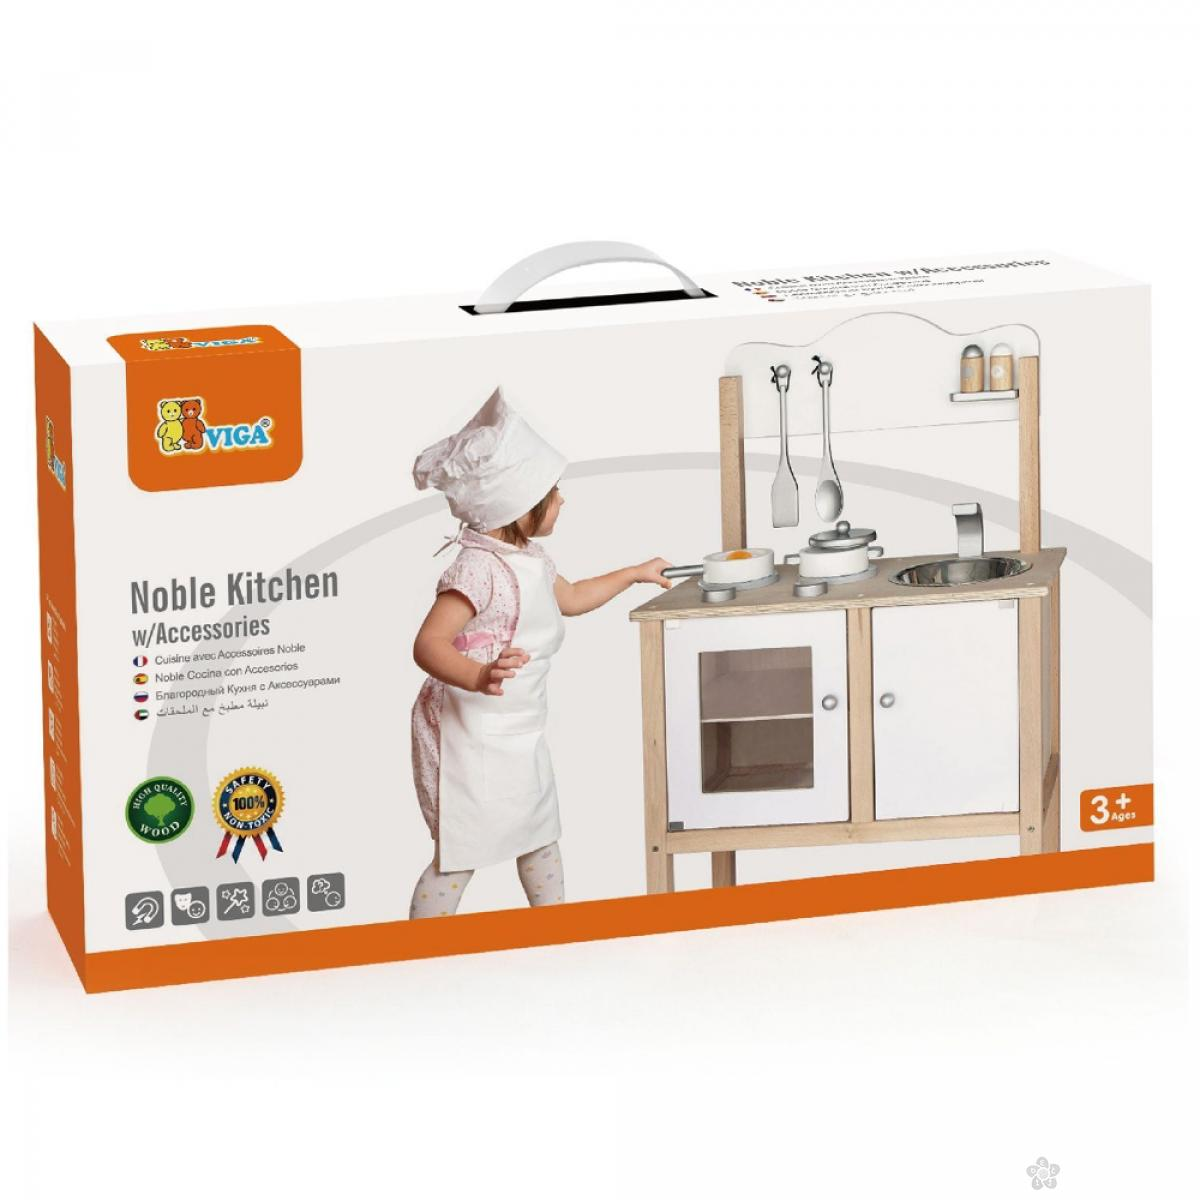 Drvena kuhinja Noble Viga, 50223